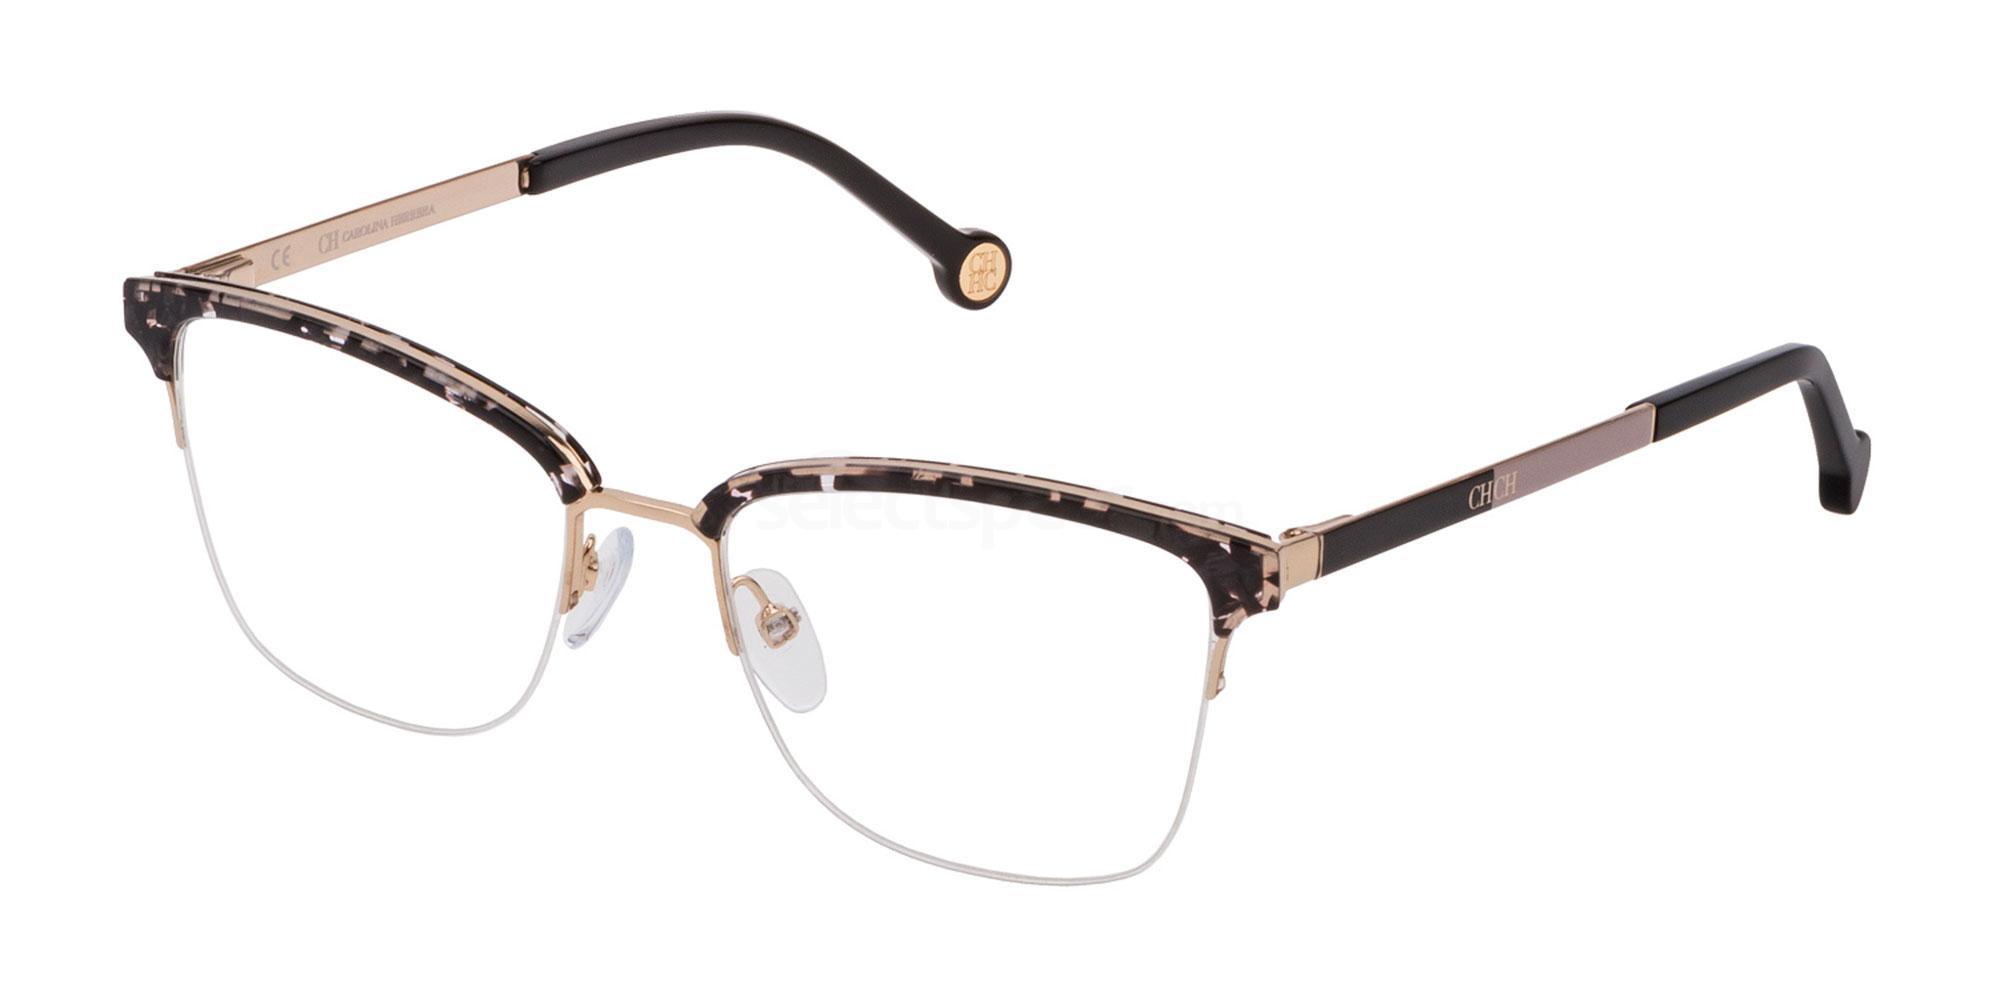 0300 VHE138 Glasses, CH Carolina Herrera